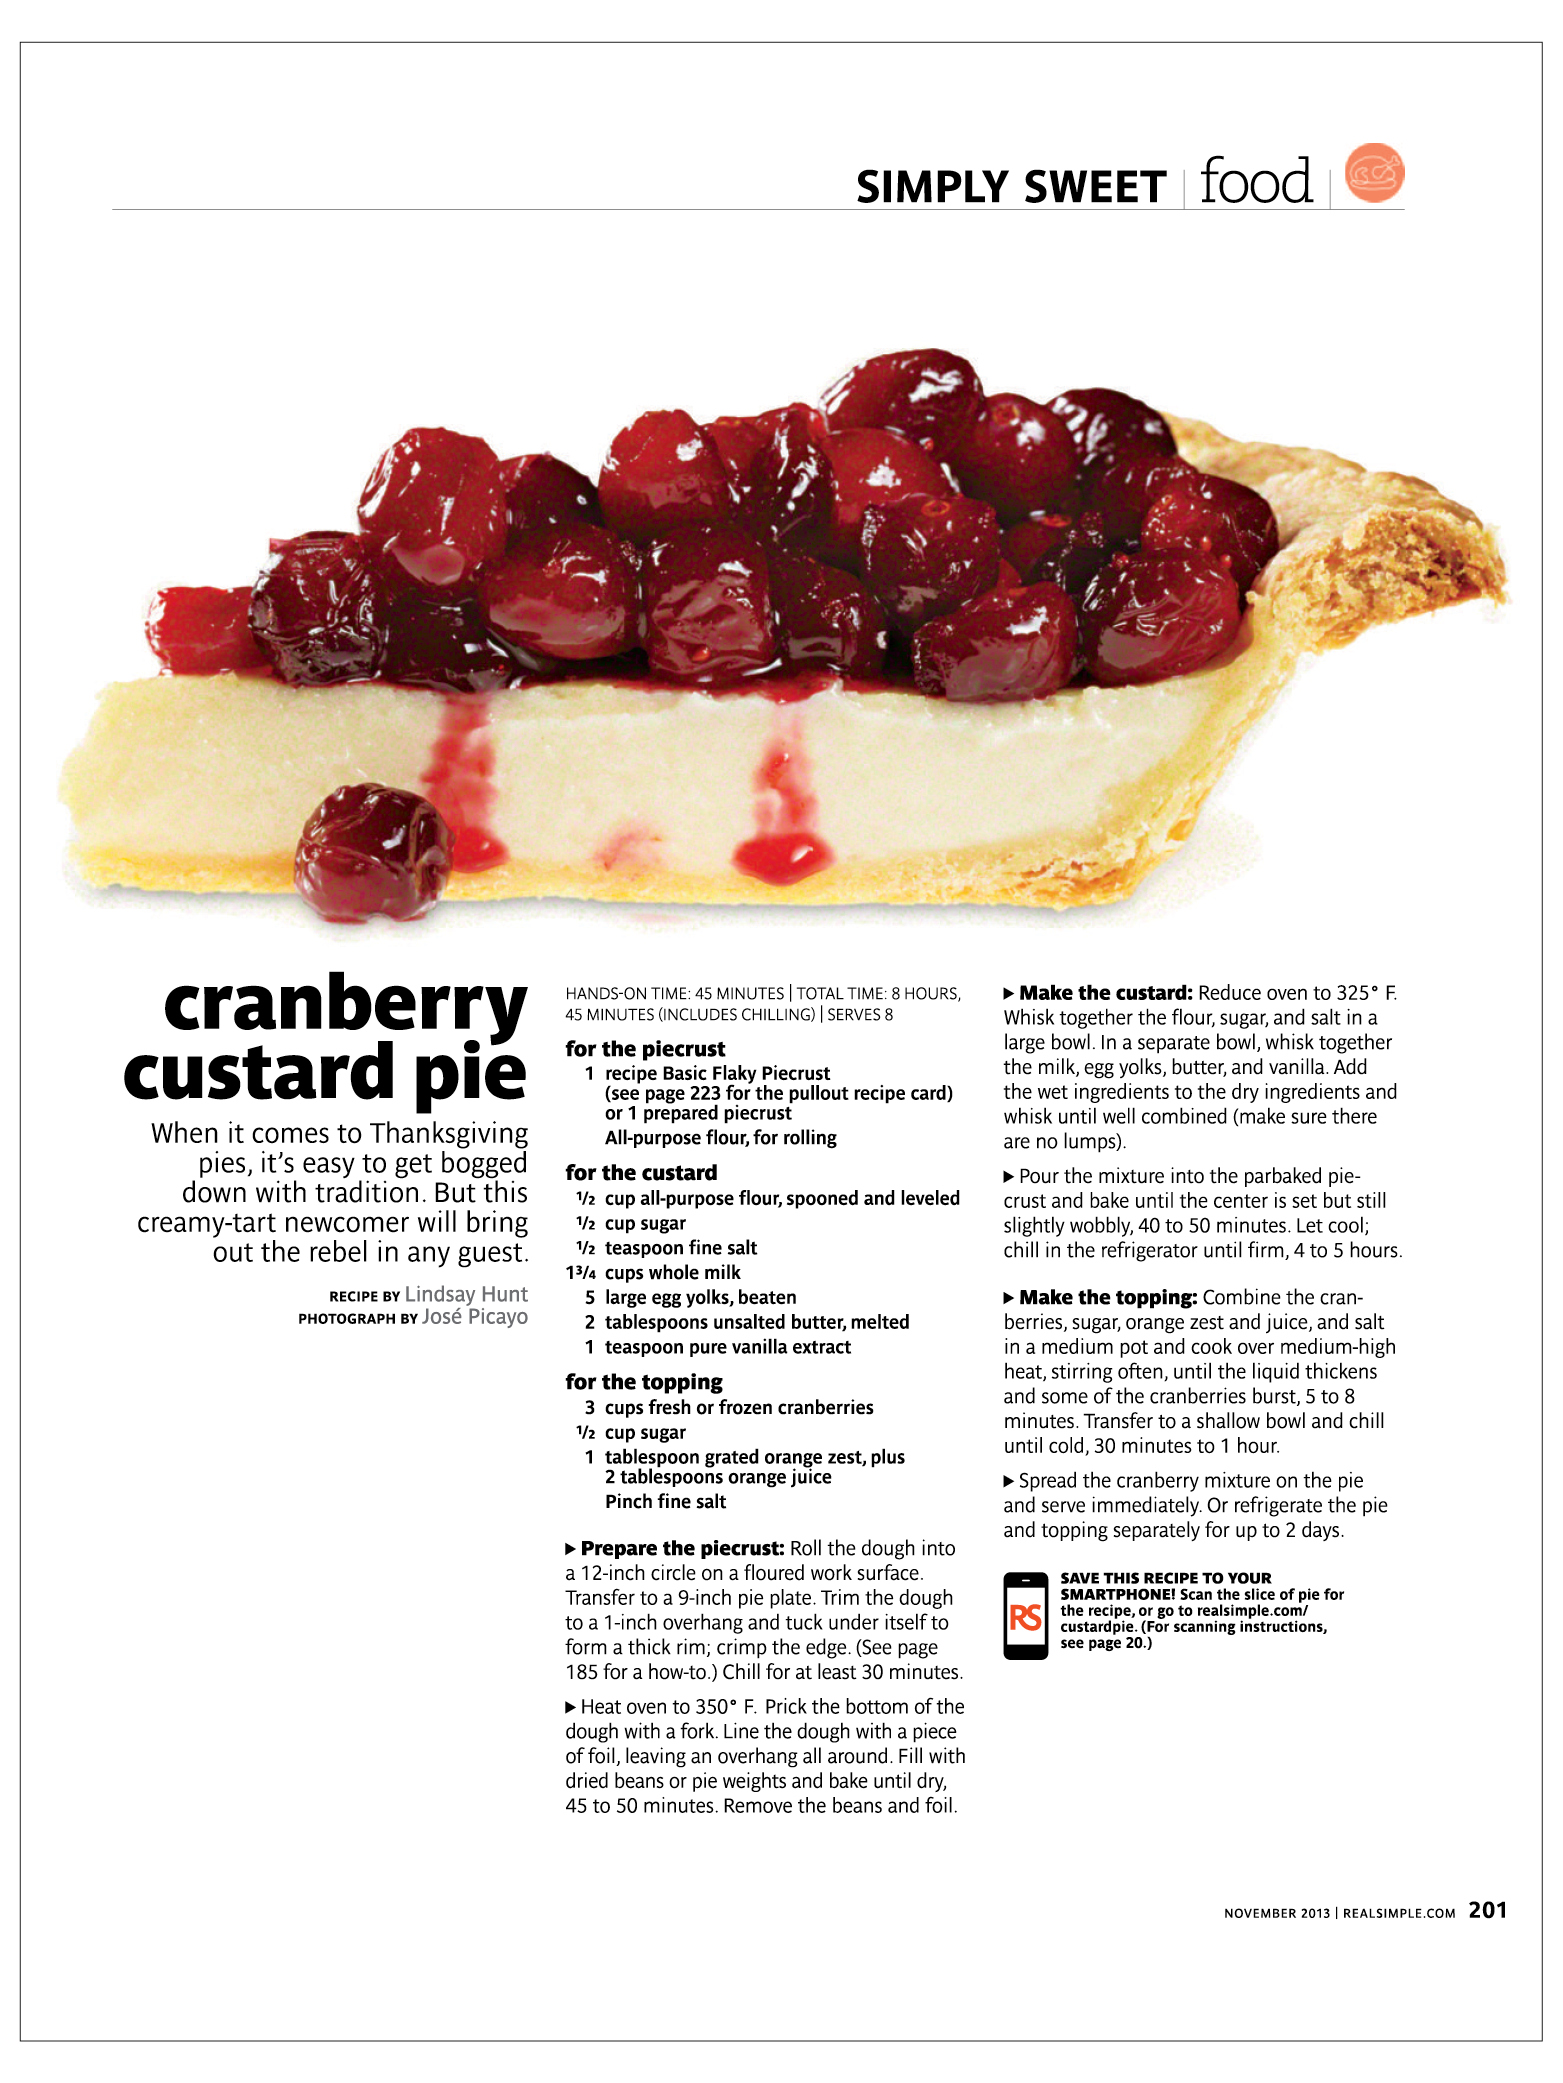 Cranberry Custard Pie  Real Simple